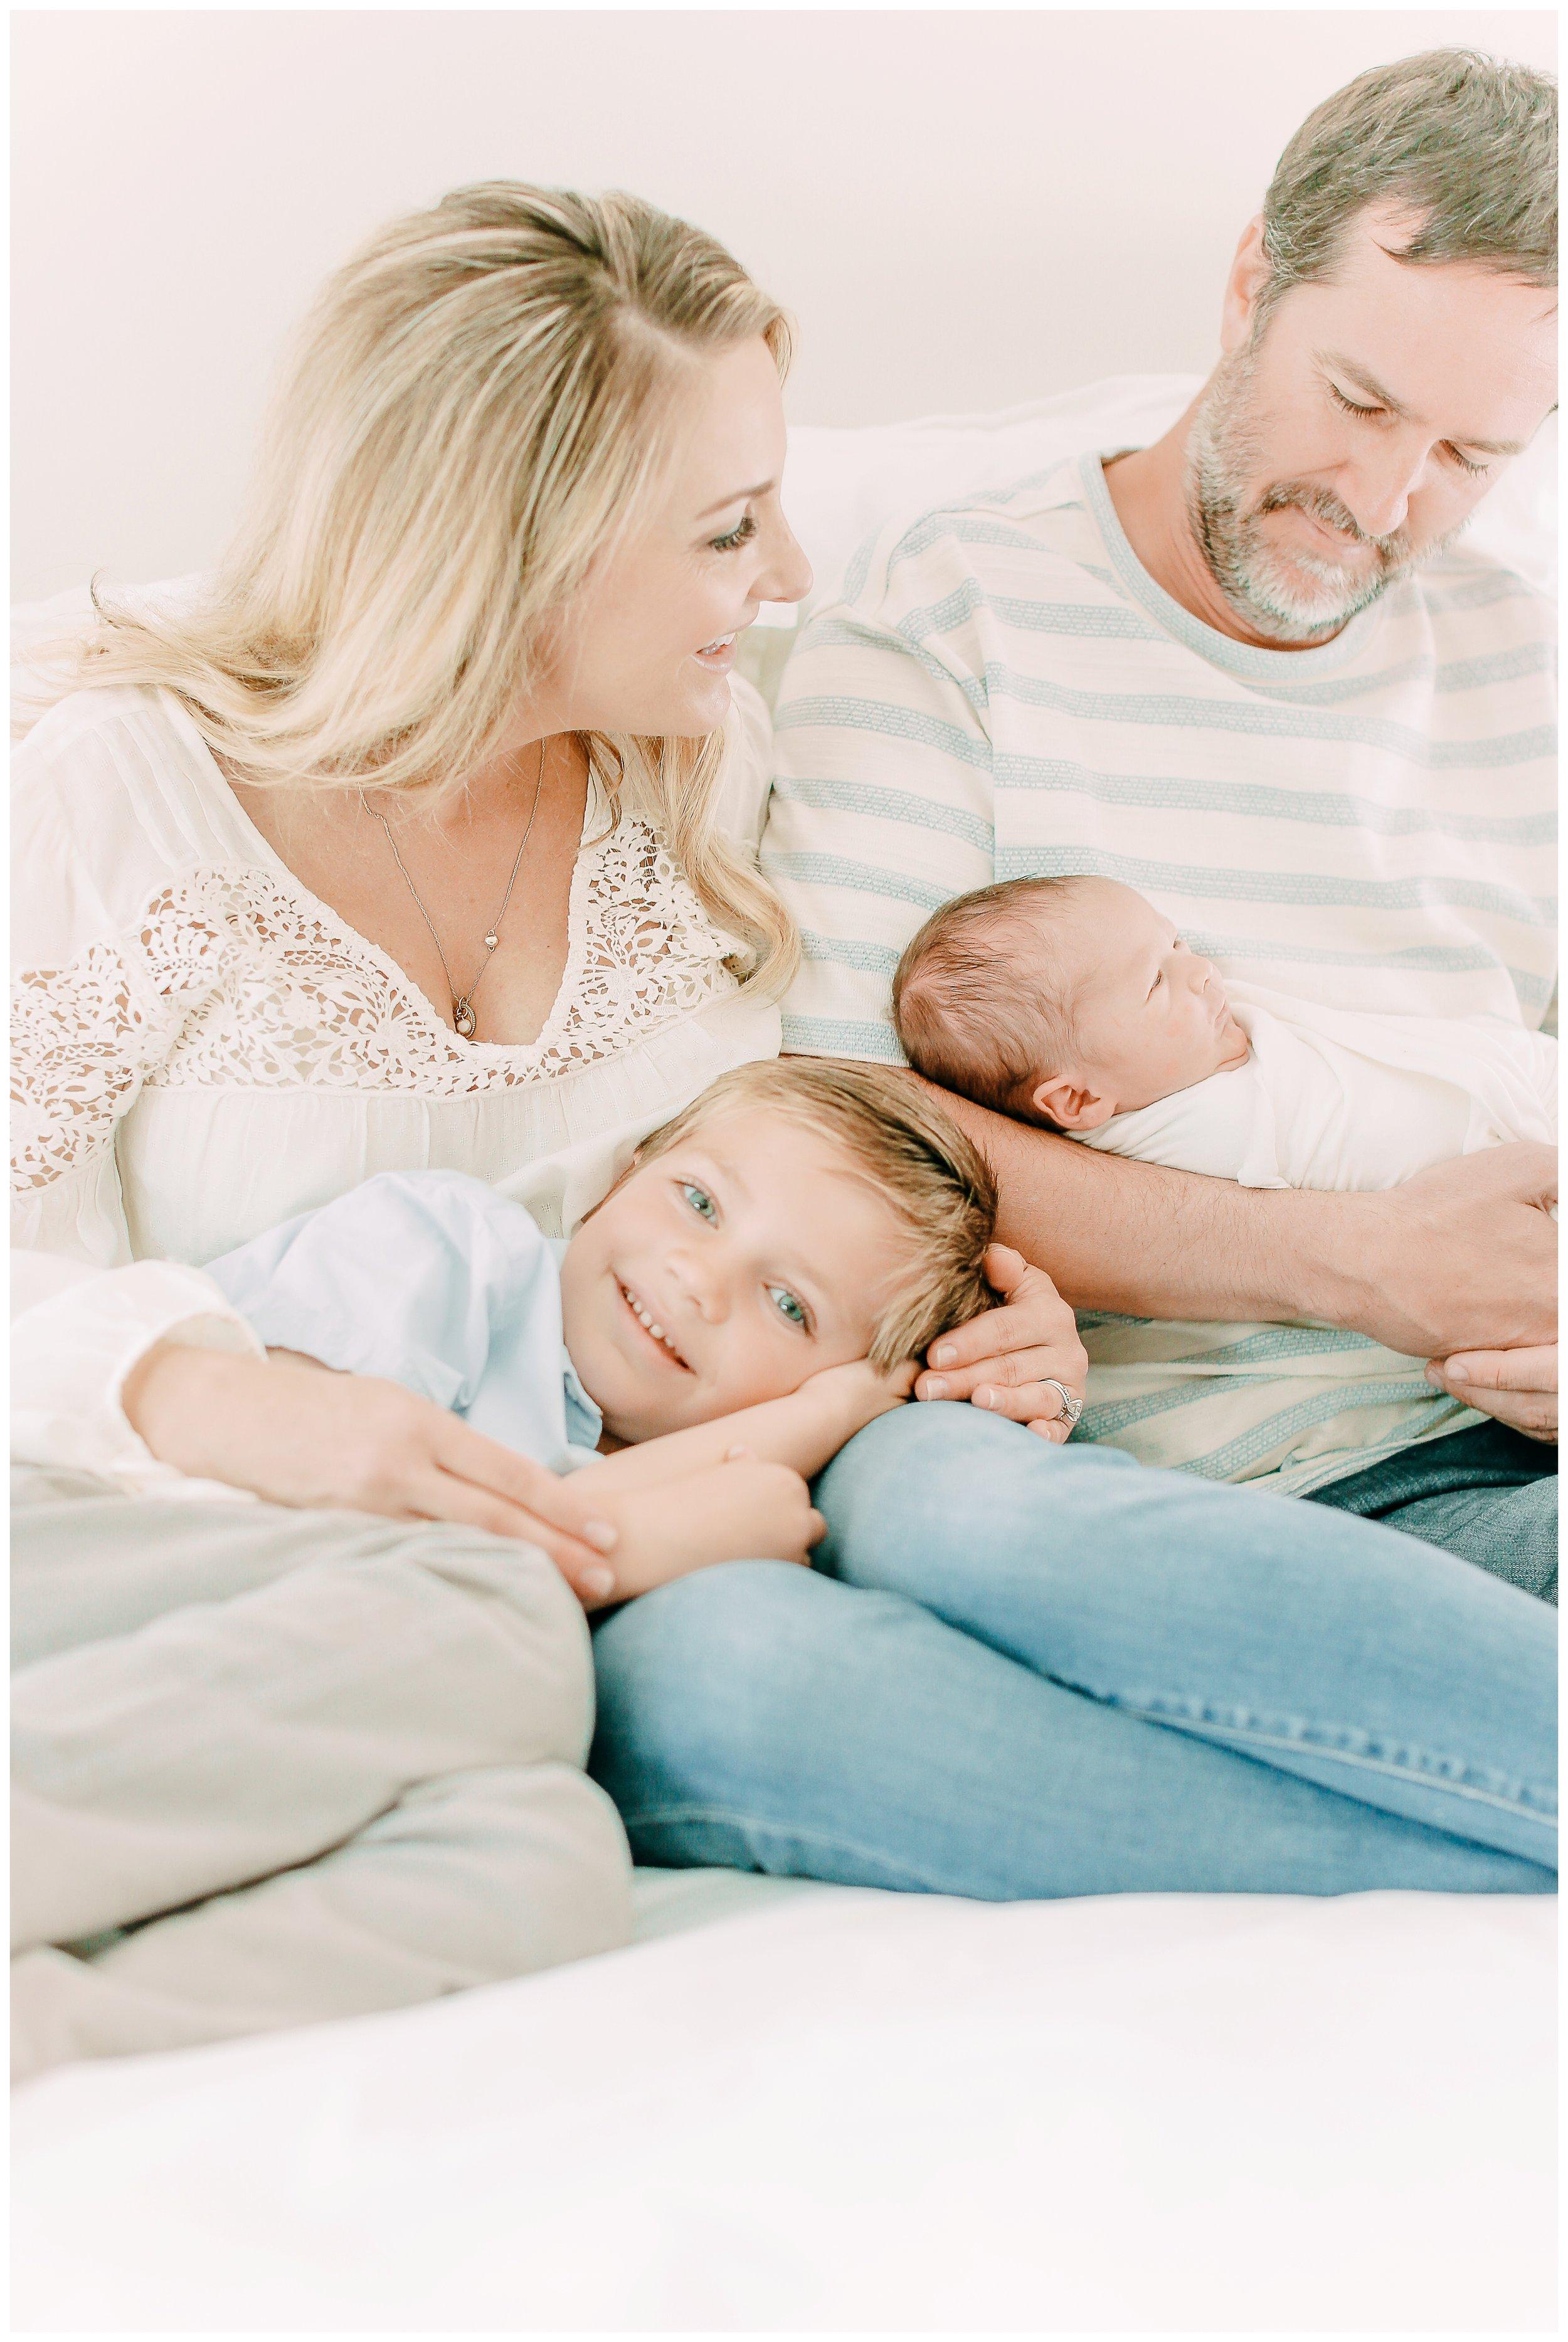 Family-Session_in-home-Orange_county_family_and_newborn-photographer_cori_kleckner_photography_Newport_beach_family_photographer__0809.jpg